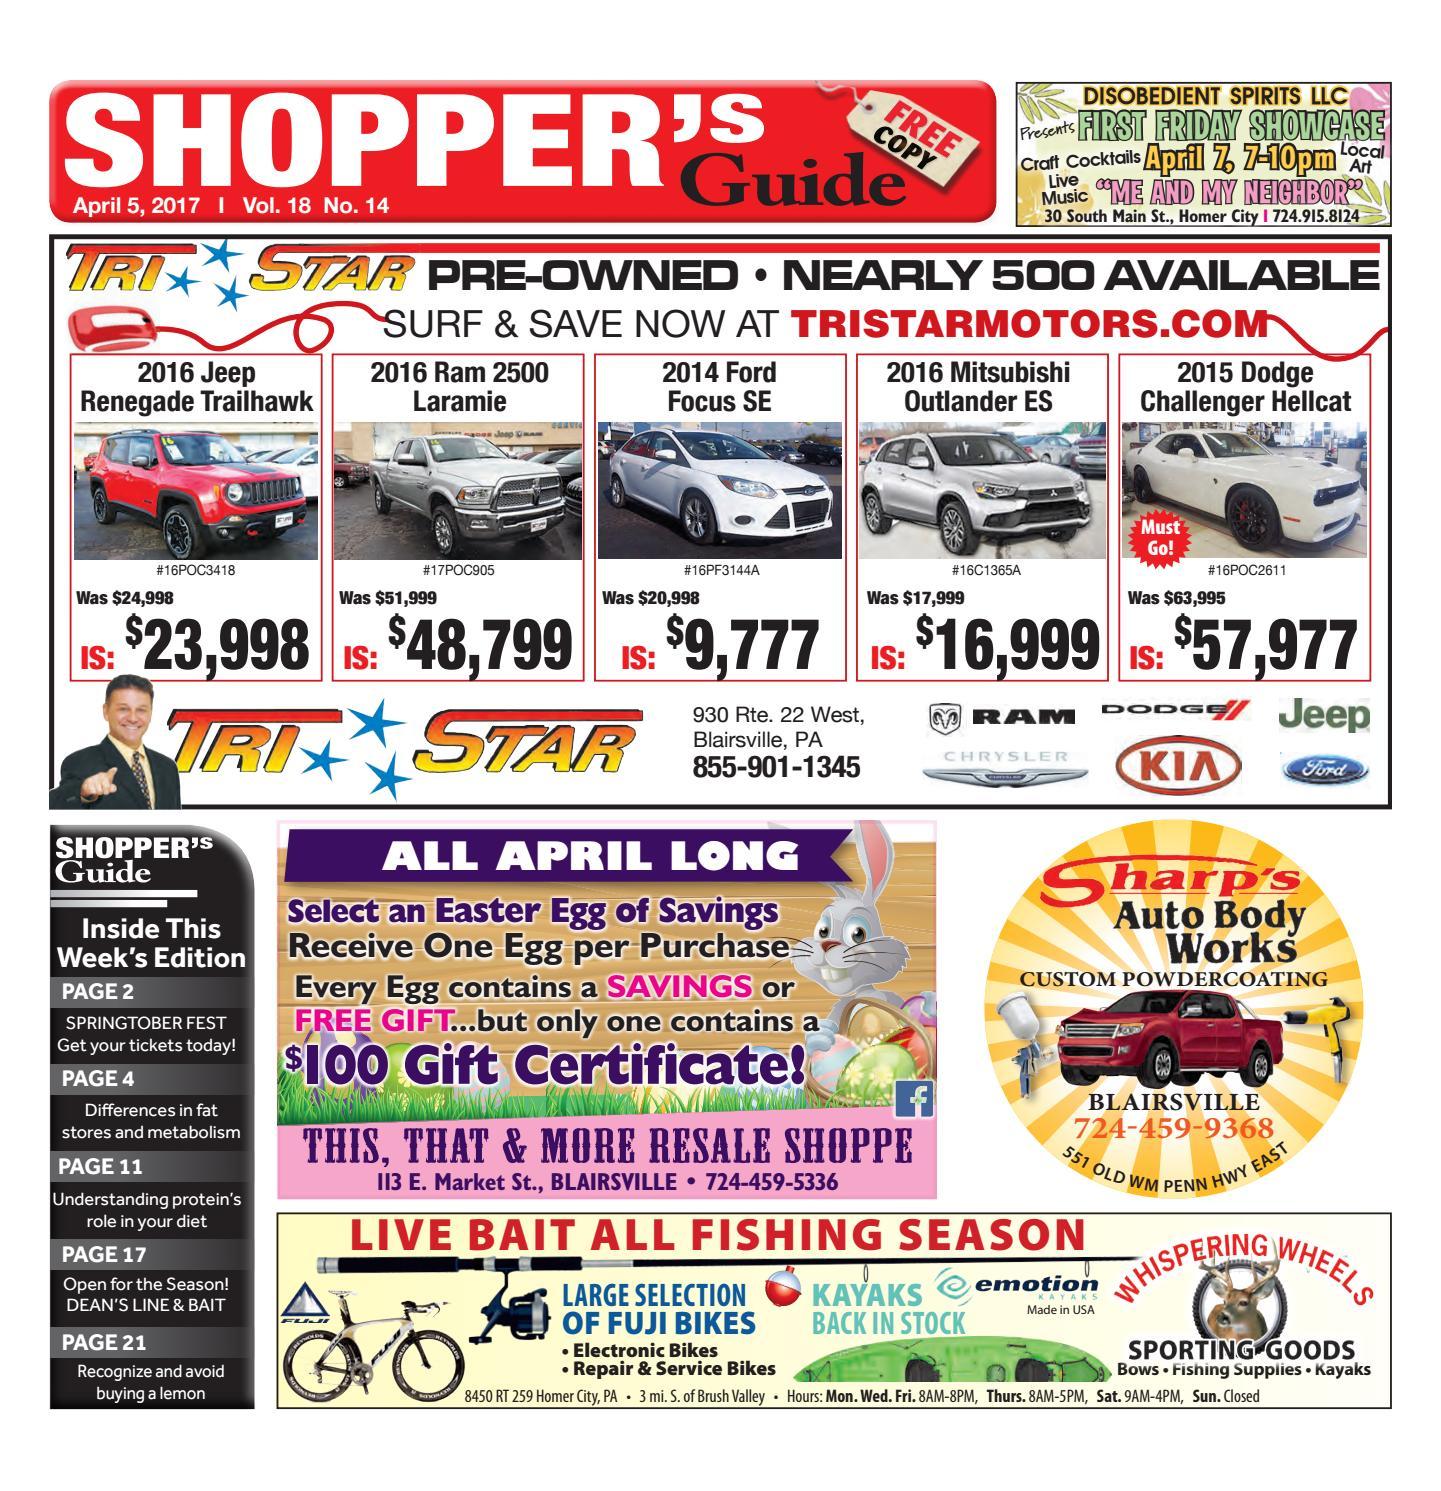 c4dda1267dab The Indiana Gazette Shoppers Guide